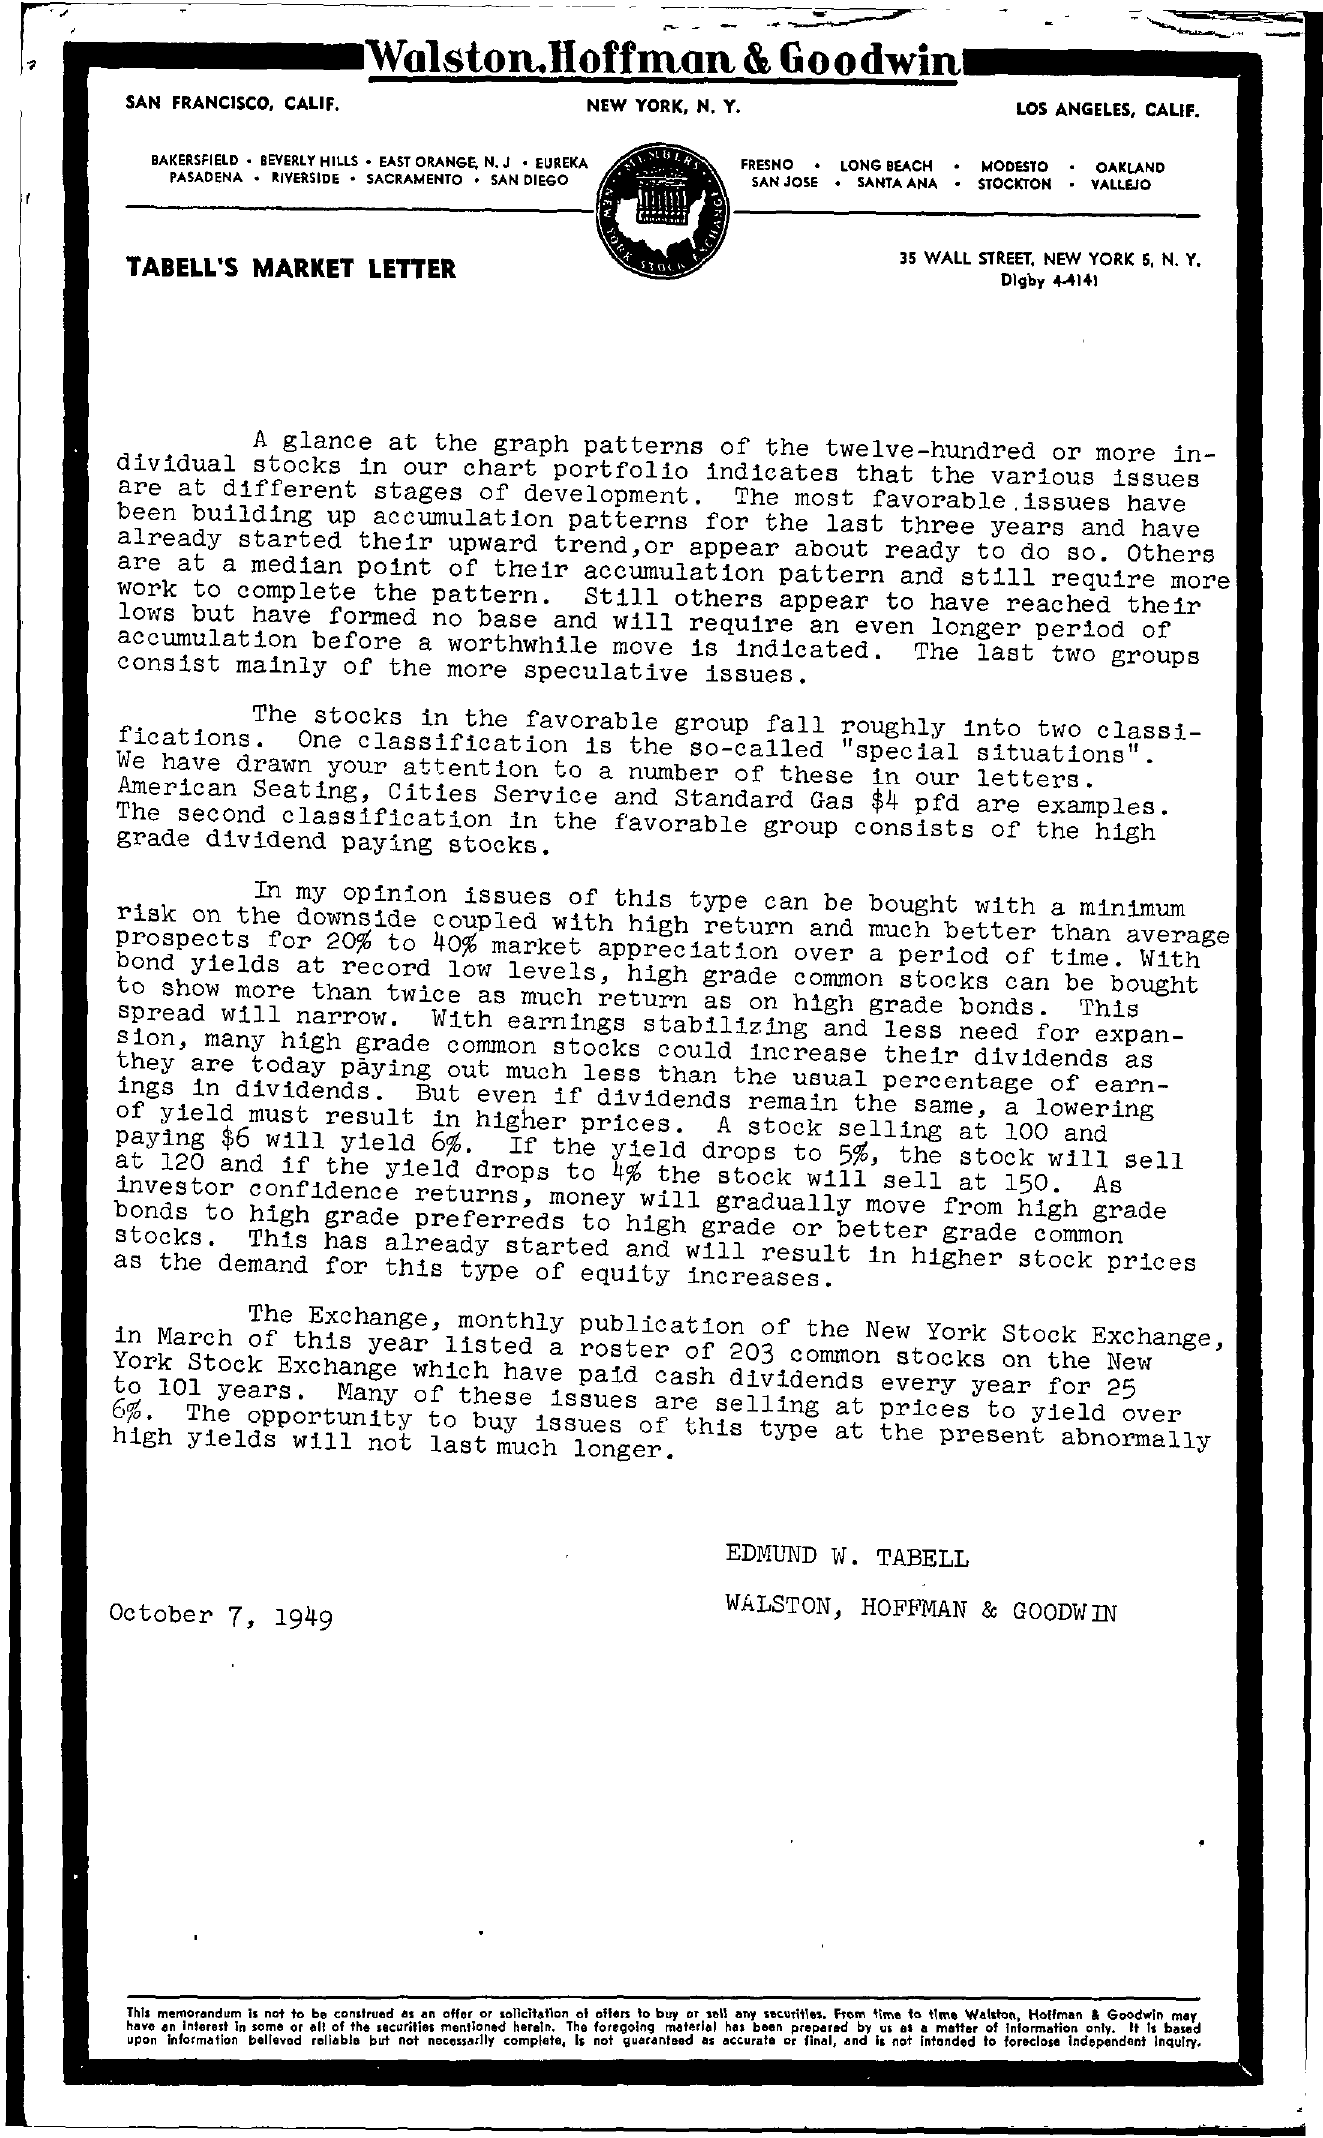 Tabell's Market Letter - October 07, 1949